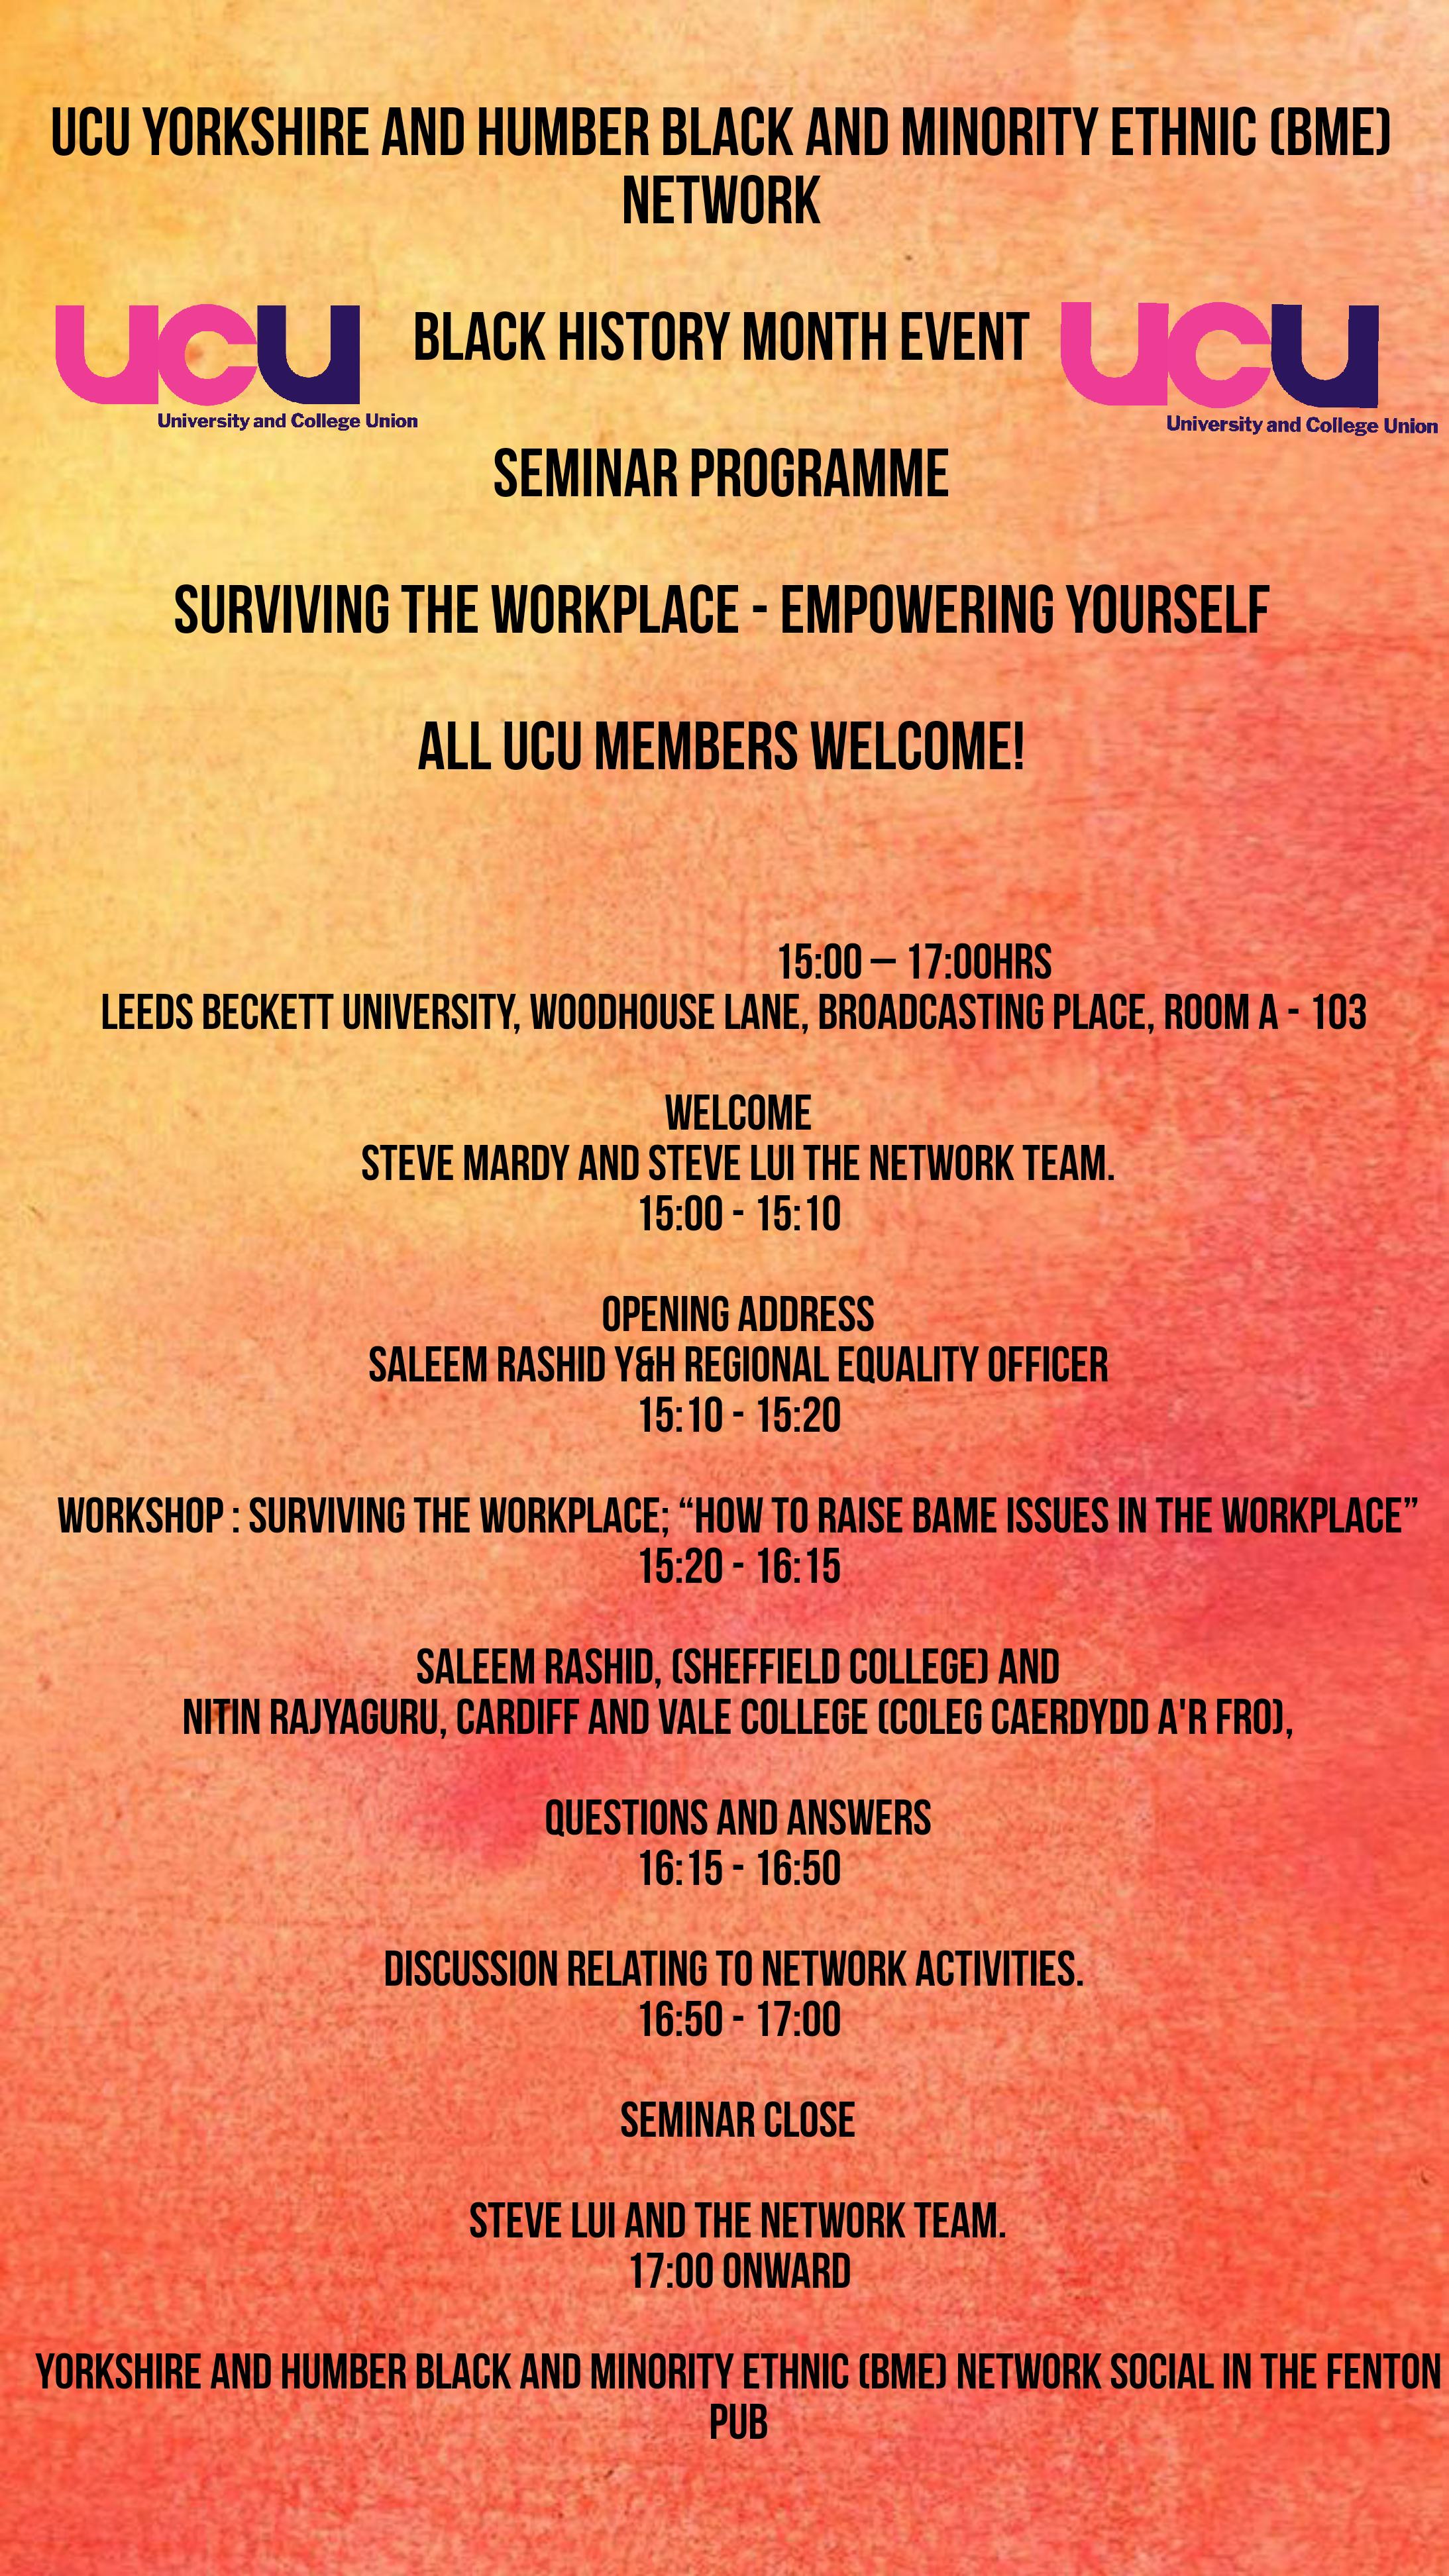 seminar programme in image format